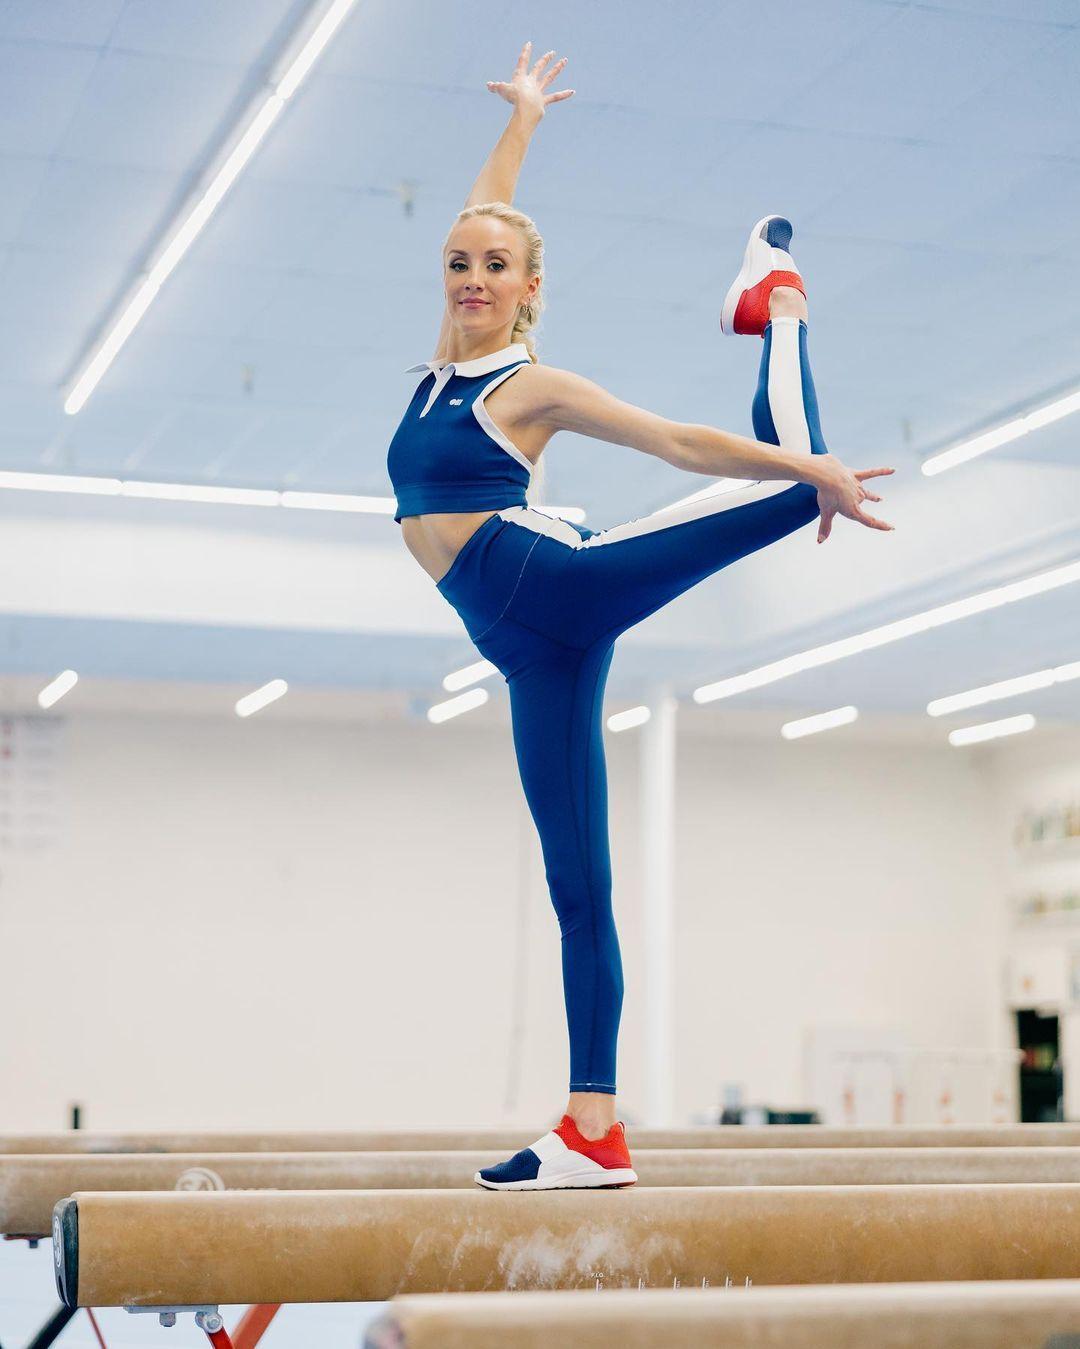 Nastia Luikin Proves She's Still Got It With Aerial Splits